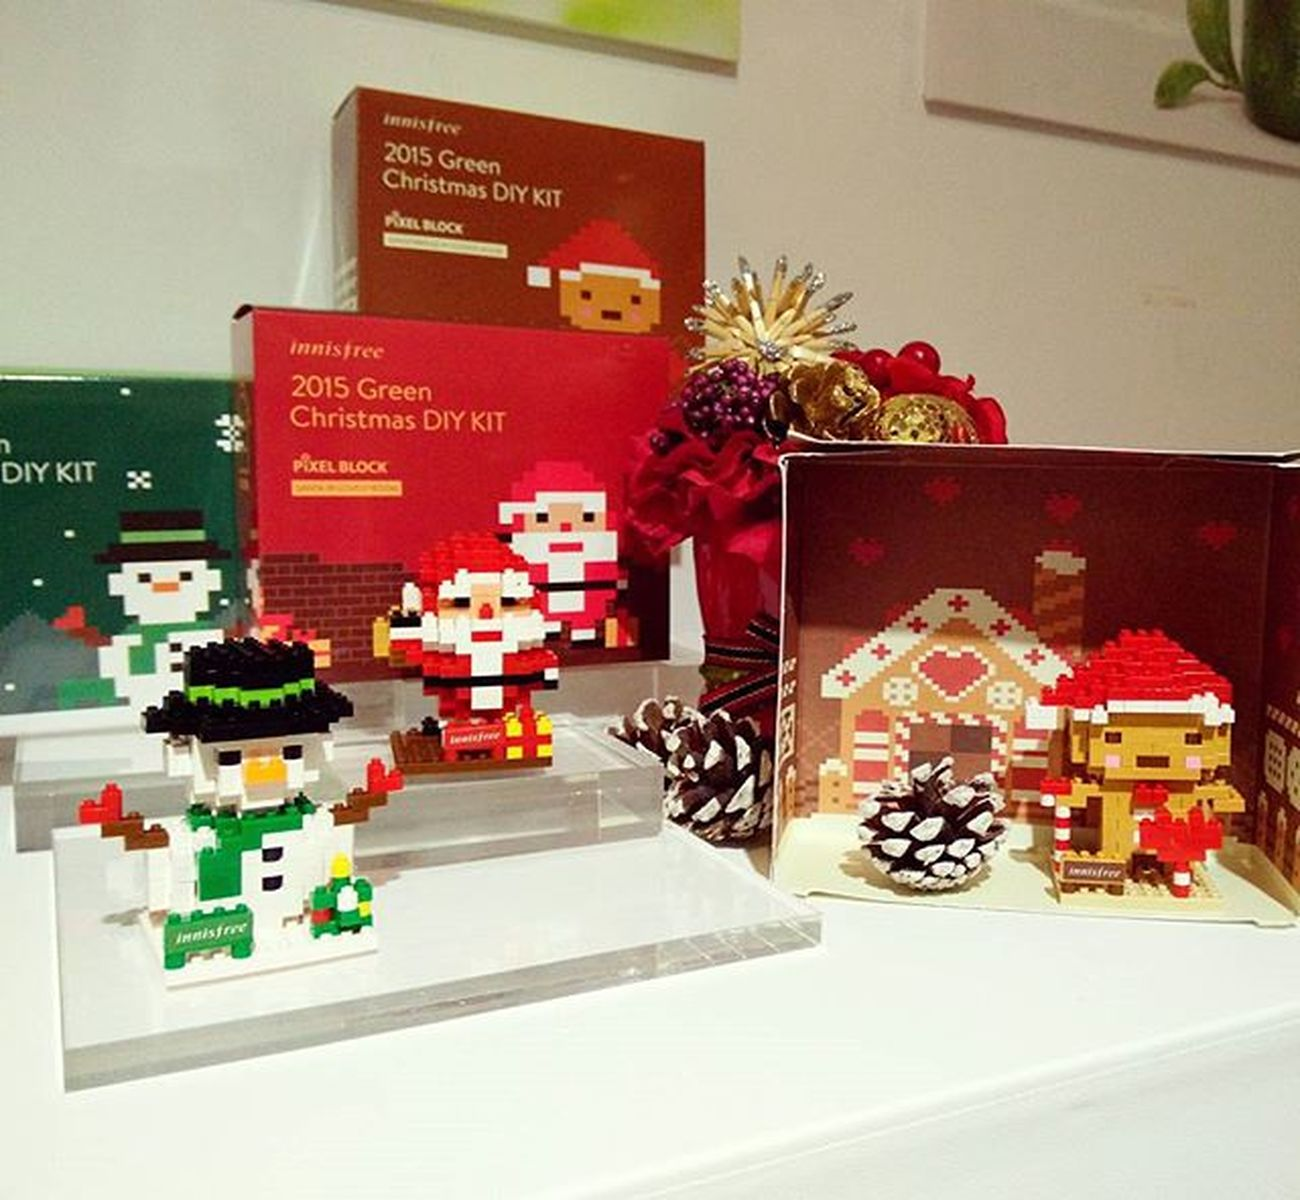 innisfree 2015 Green Christmas 綠色聖誕登場。今年的公益禮盒是小積木🎅,太可愛了!Innisfree Innisfreetw Greenchirstmas 이니스프리 Mobile01 愛曼達